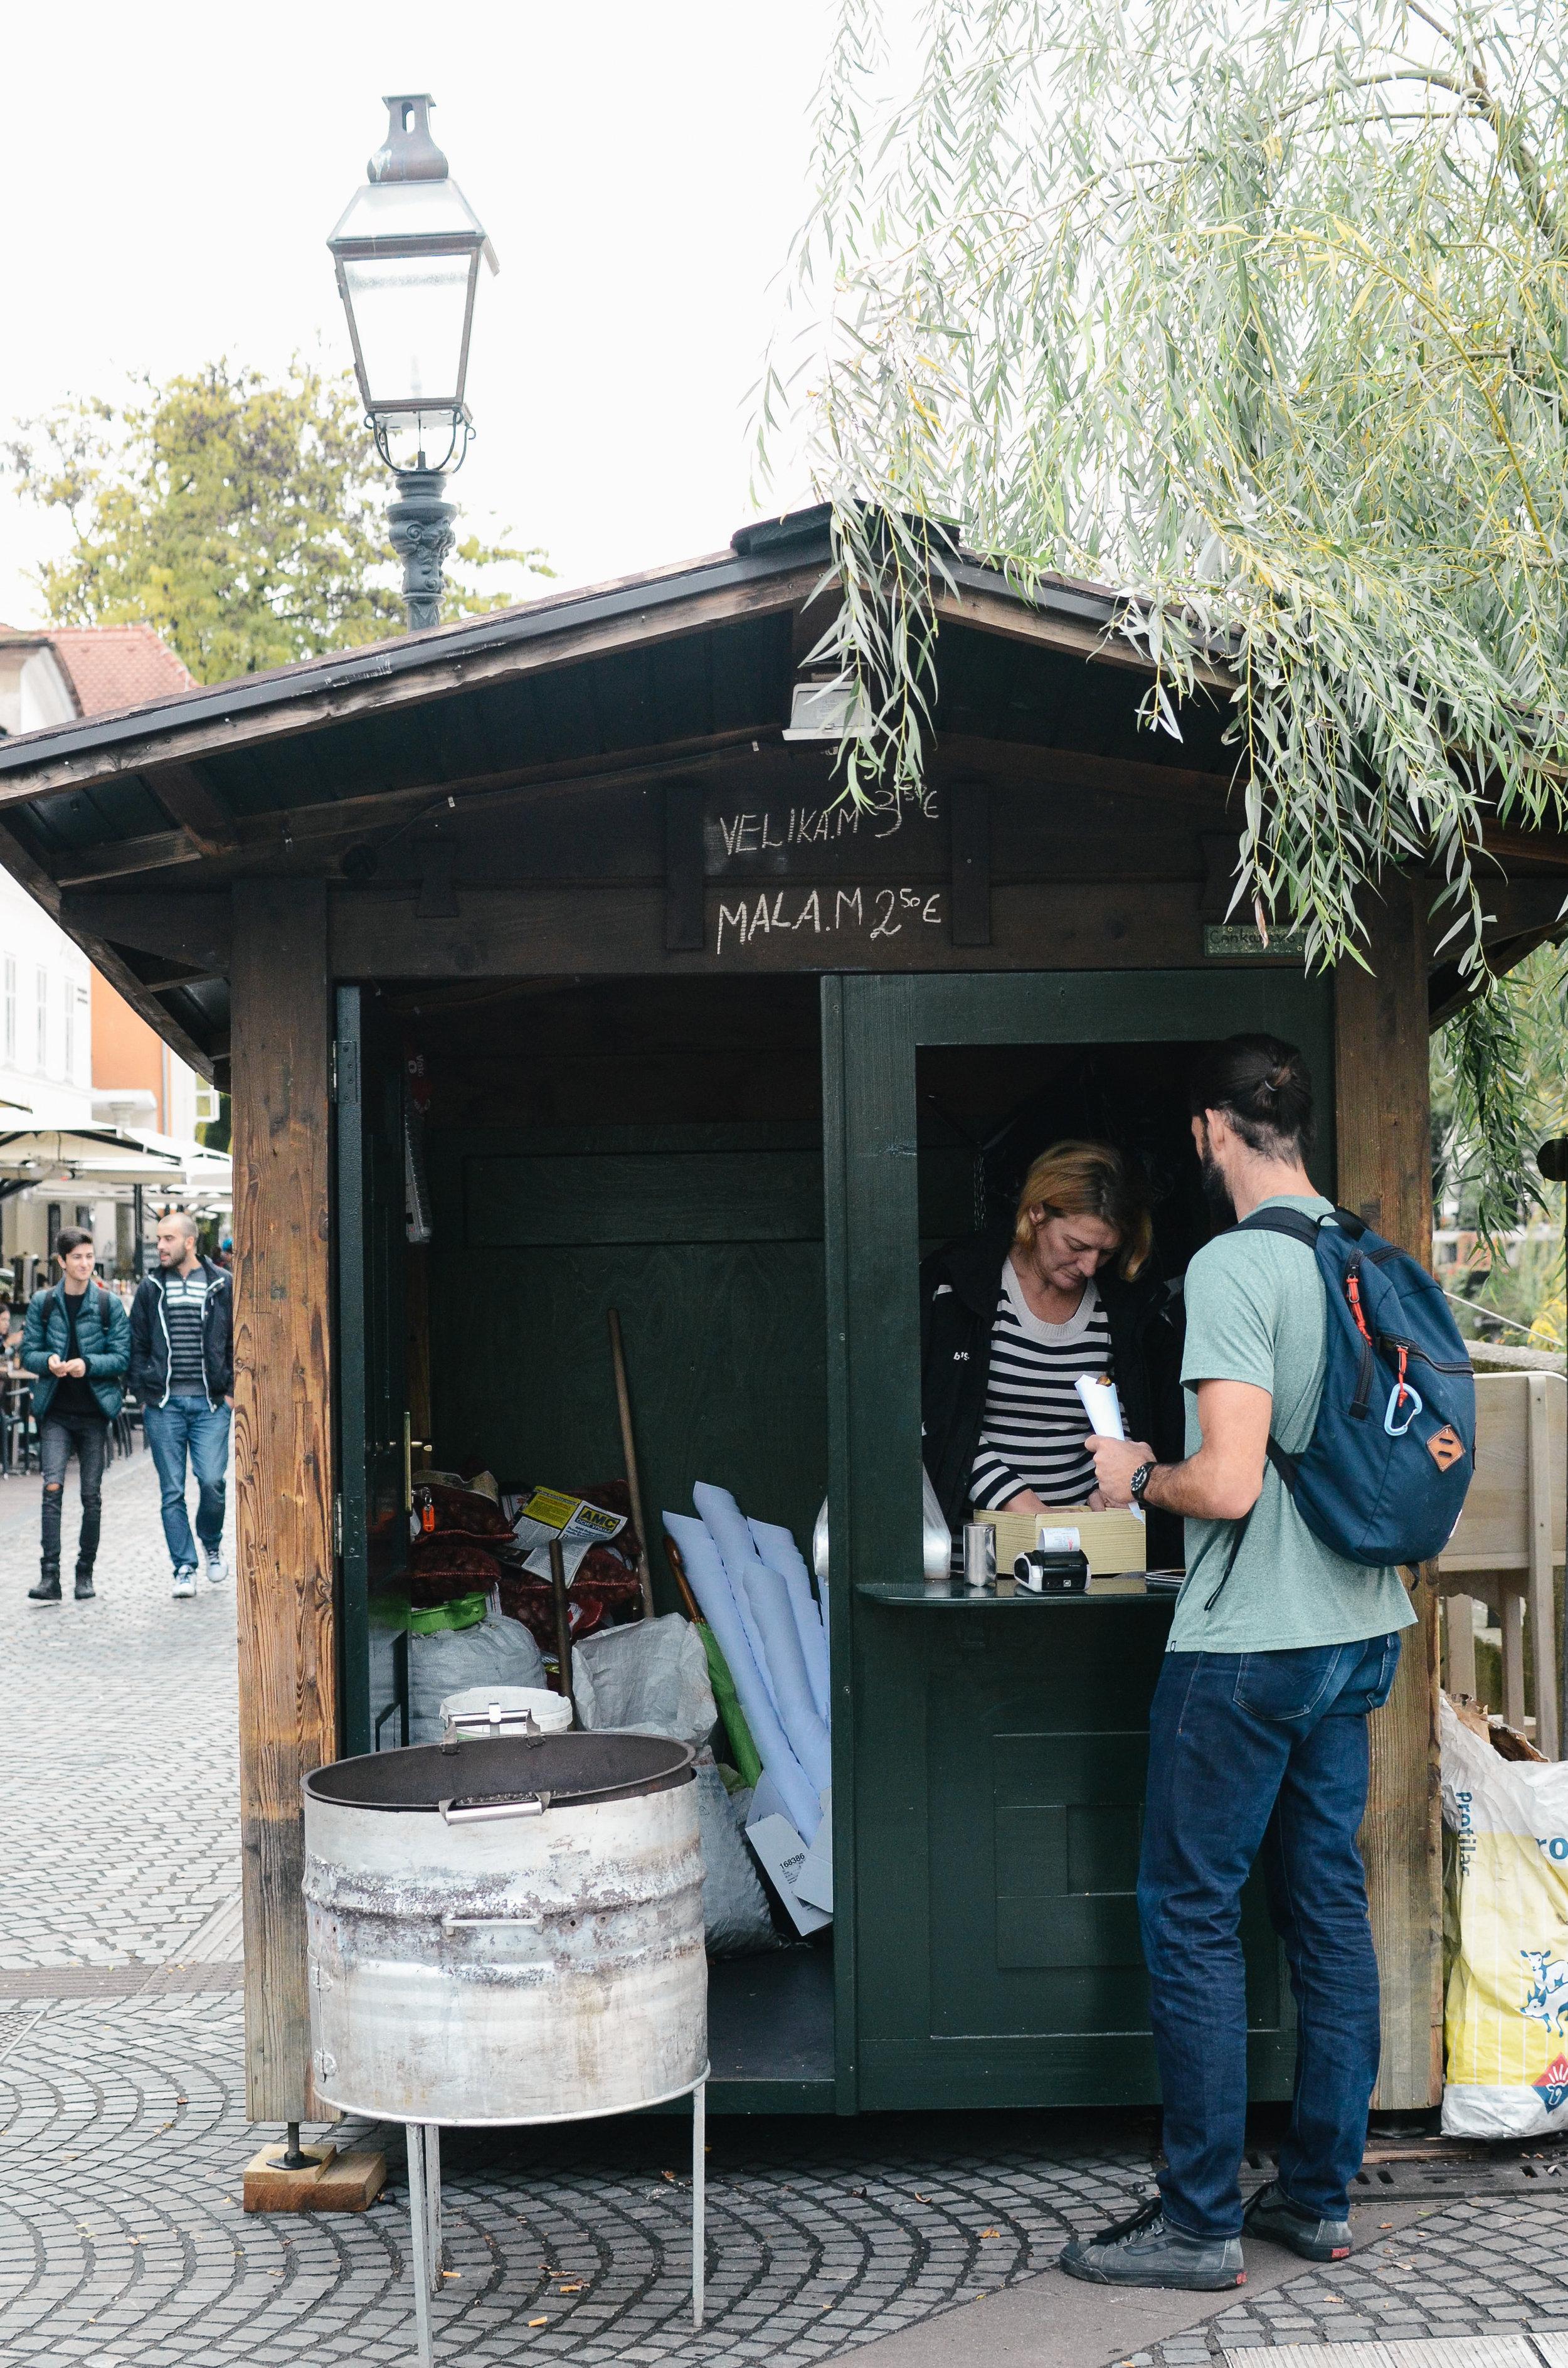 ljubljana-slovenia-travel-guide-lifeonpine_DSC_1768.jpg